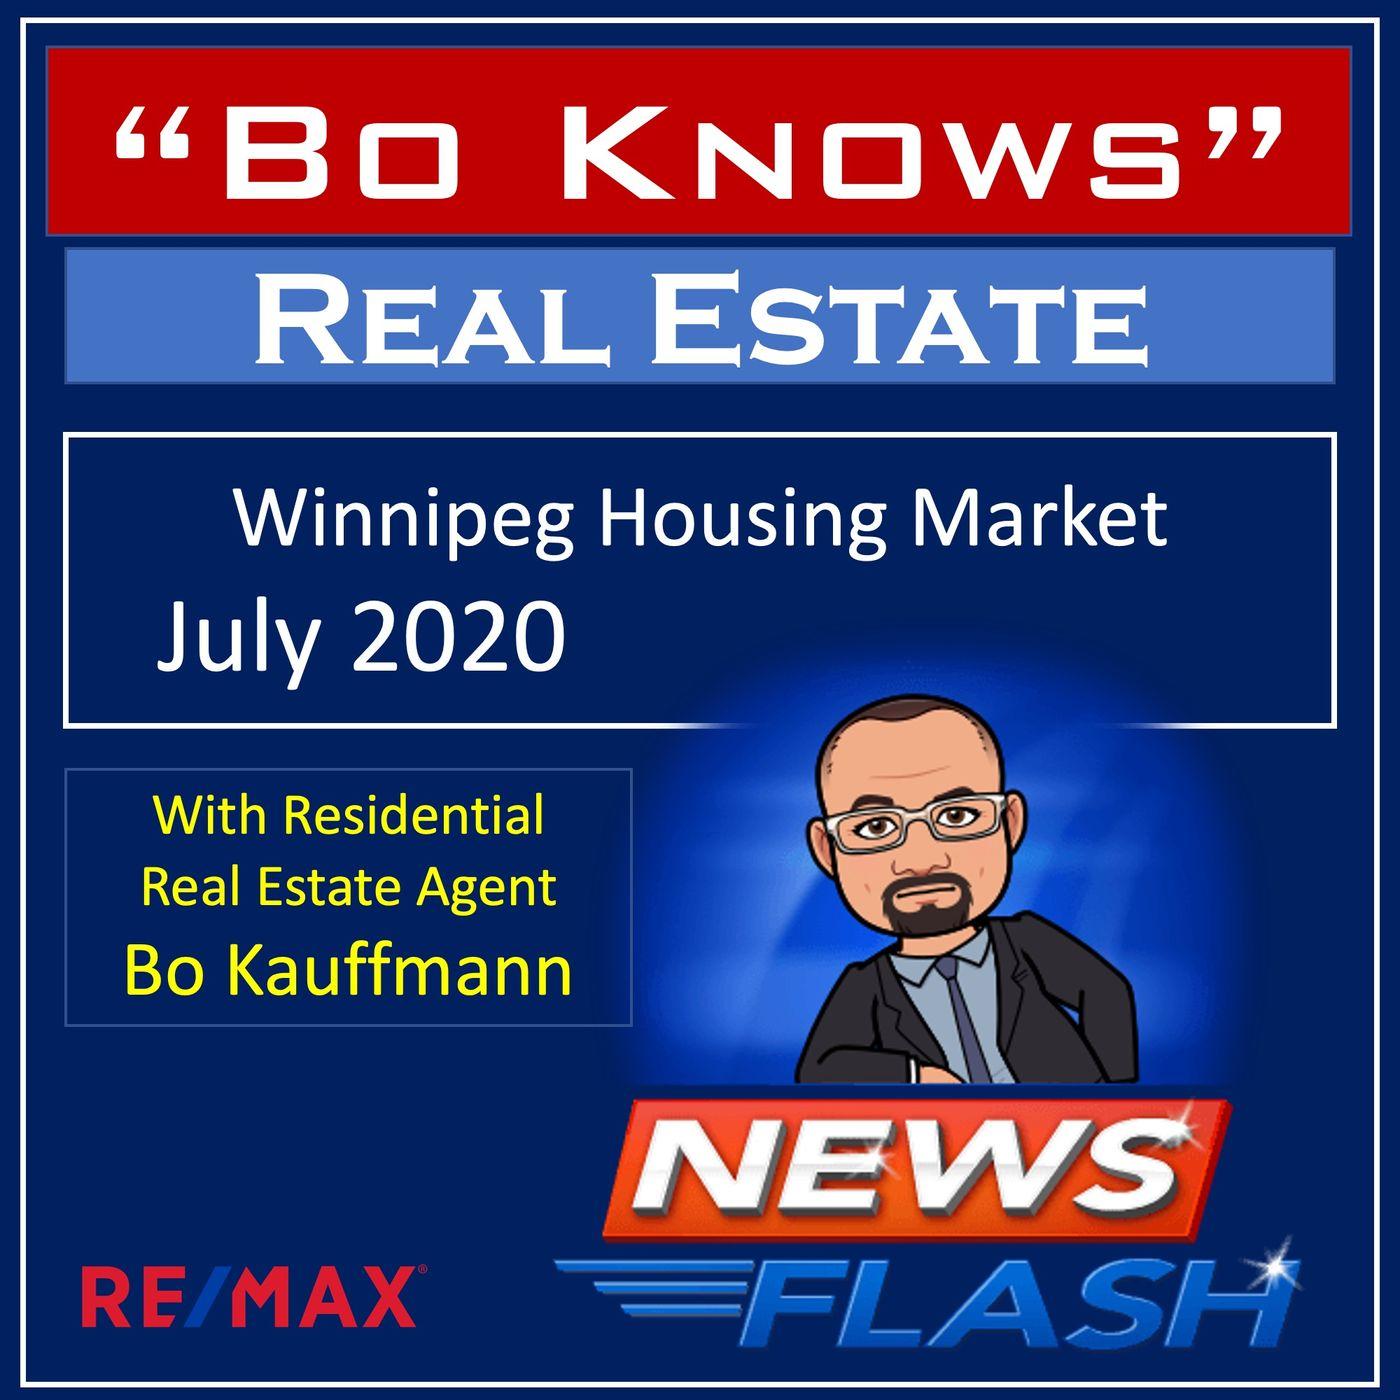 Winnipeg Housing Market July 2020